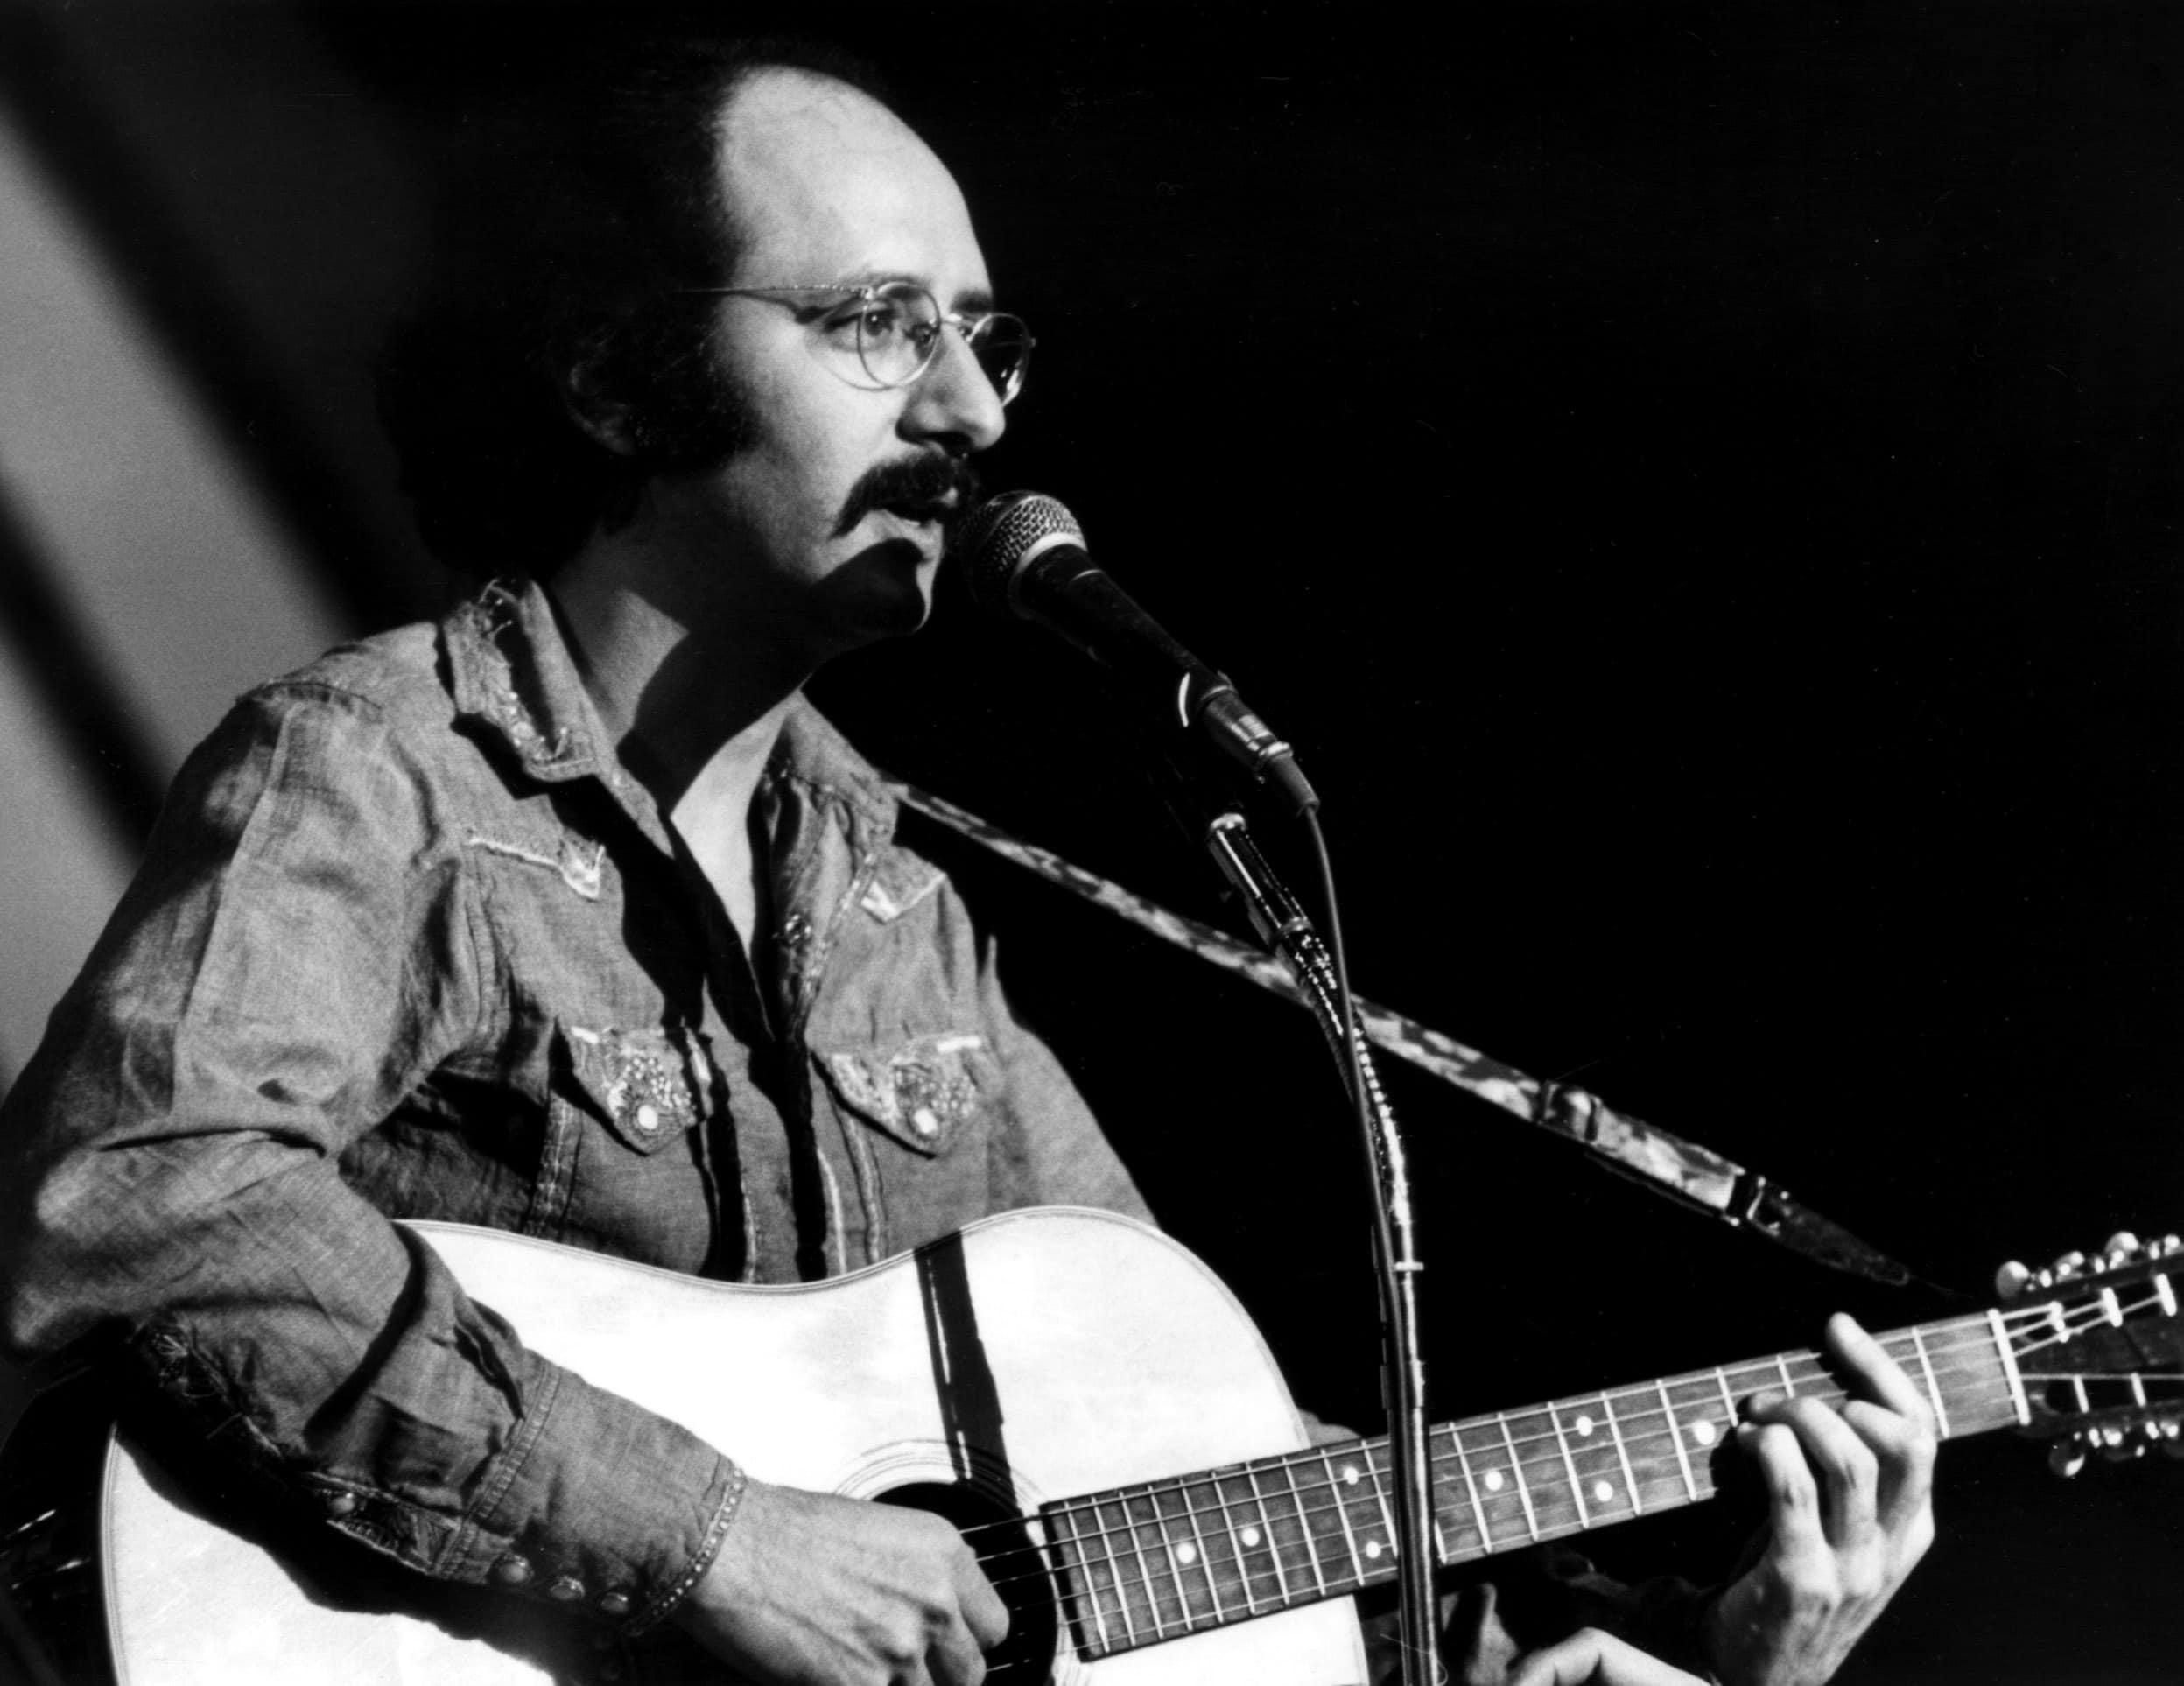 Peter Yarrow, ca. early 1970s